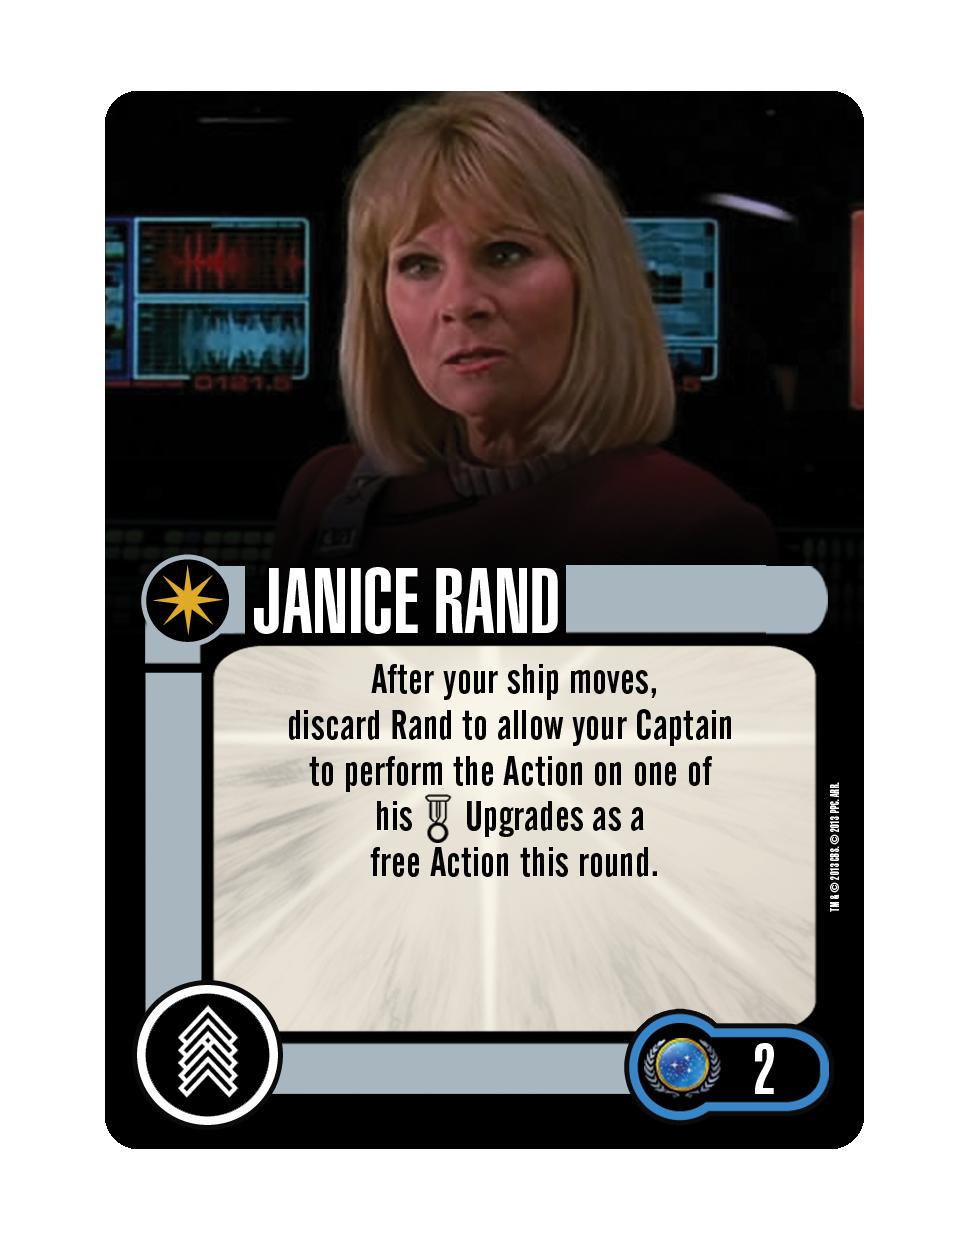 Crew_Janice_Rand